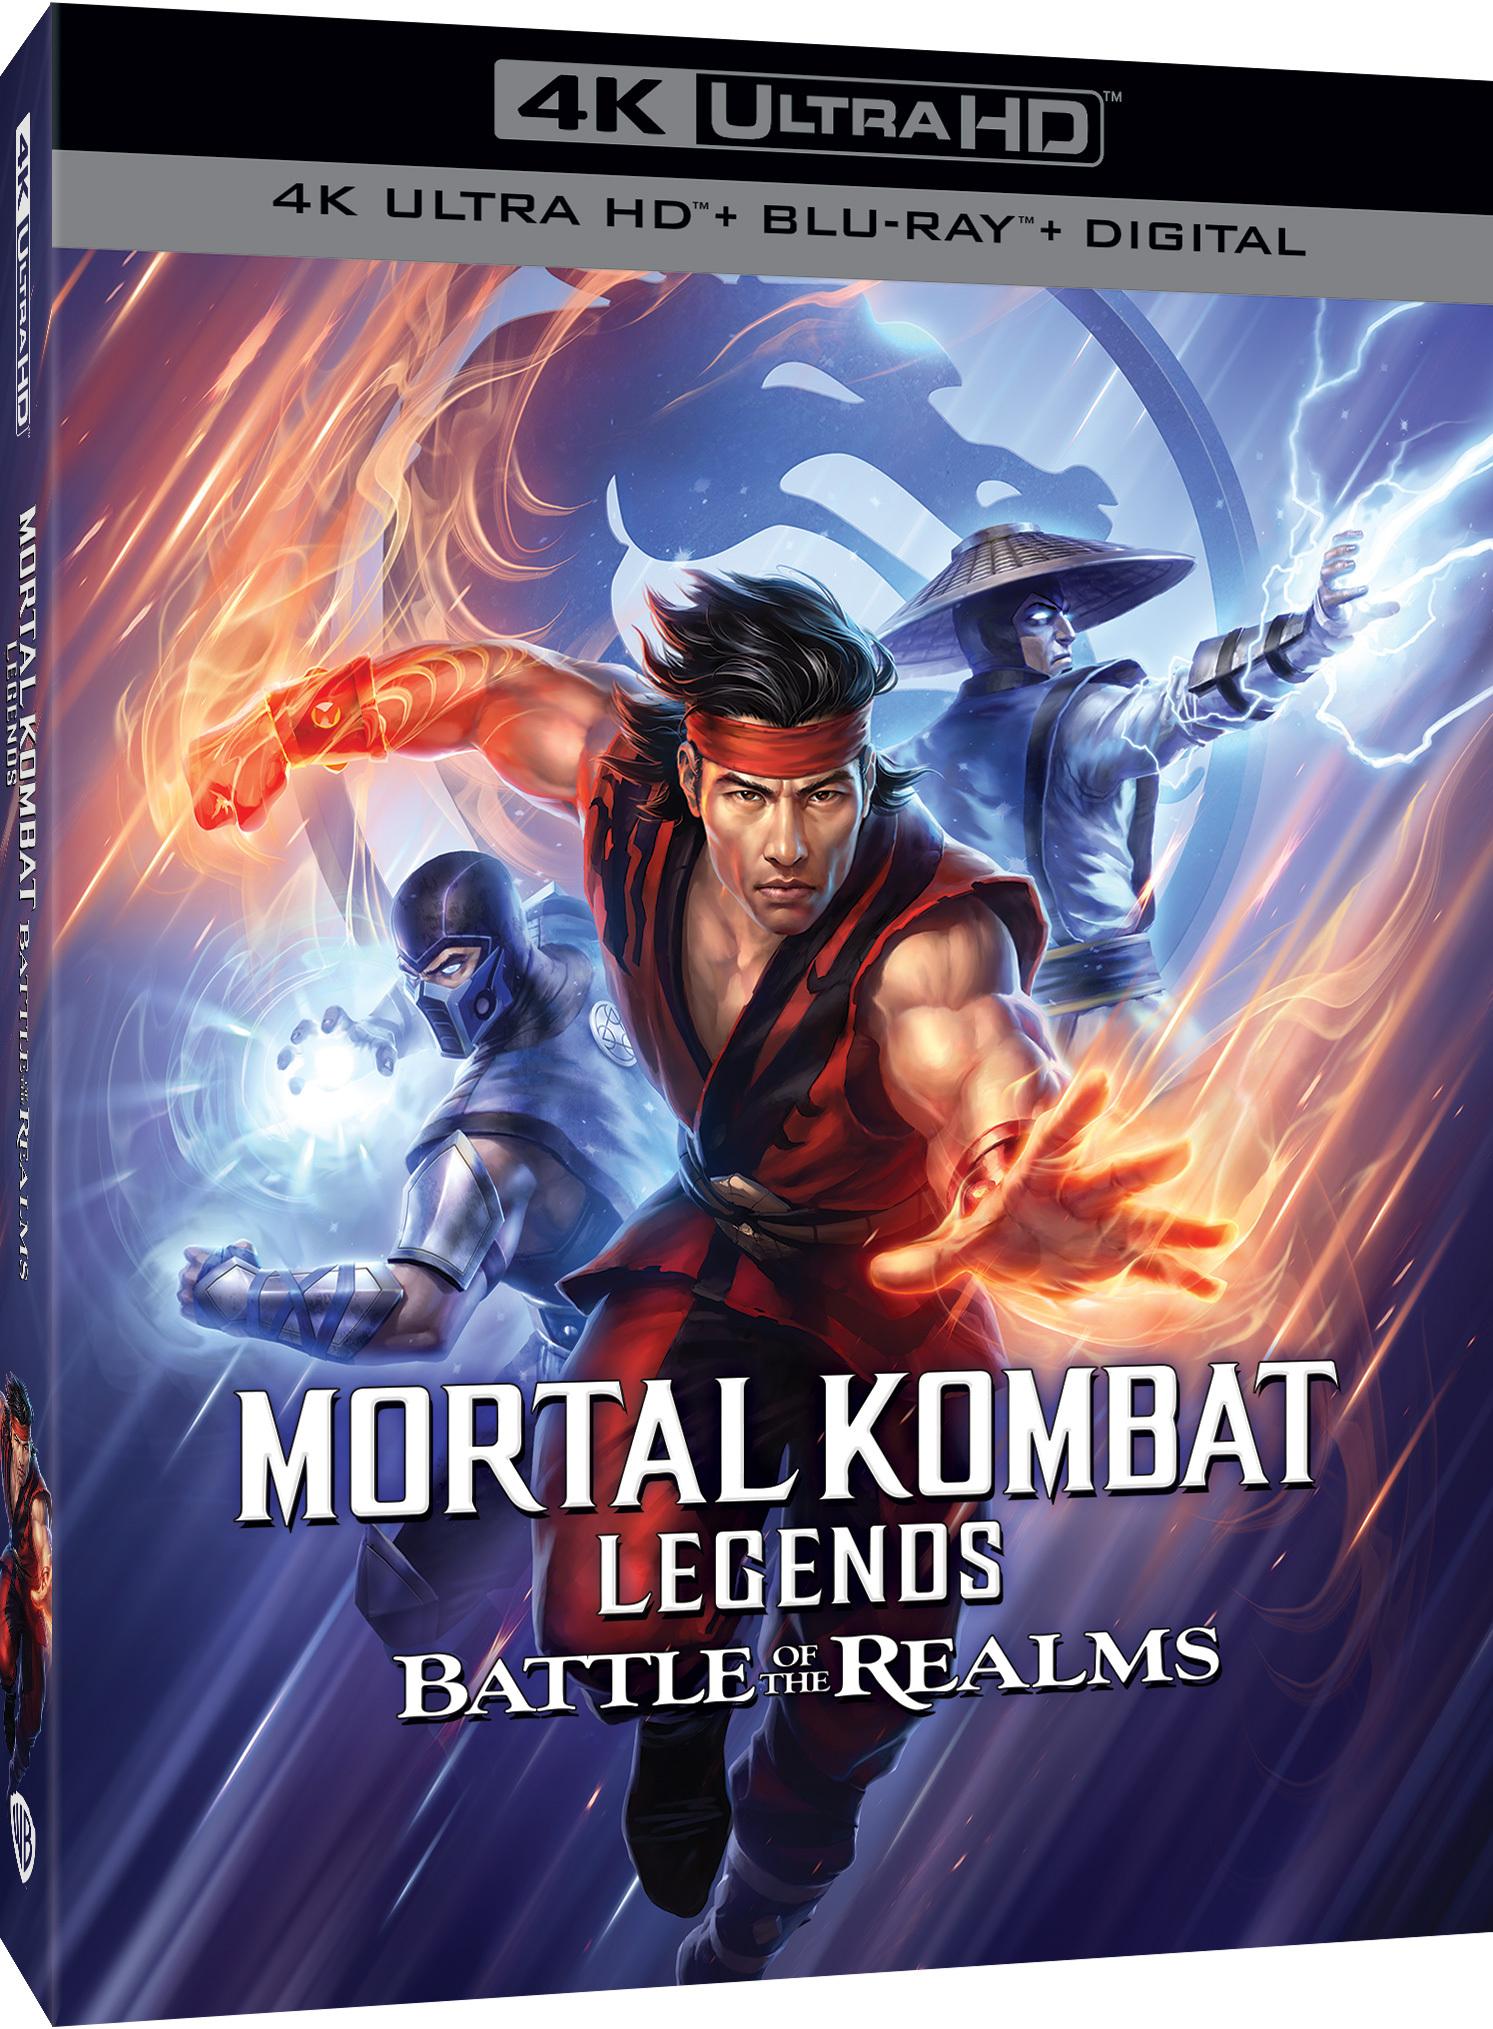 """Mortal Kombat Legends: Battle of the Realms"""